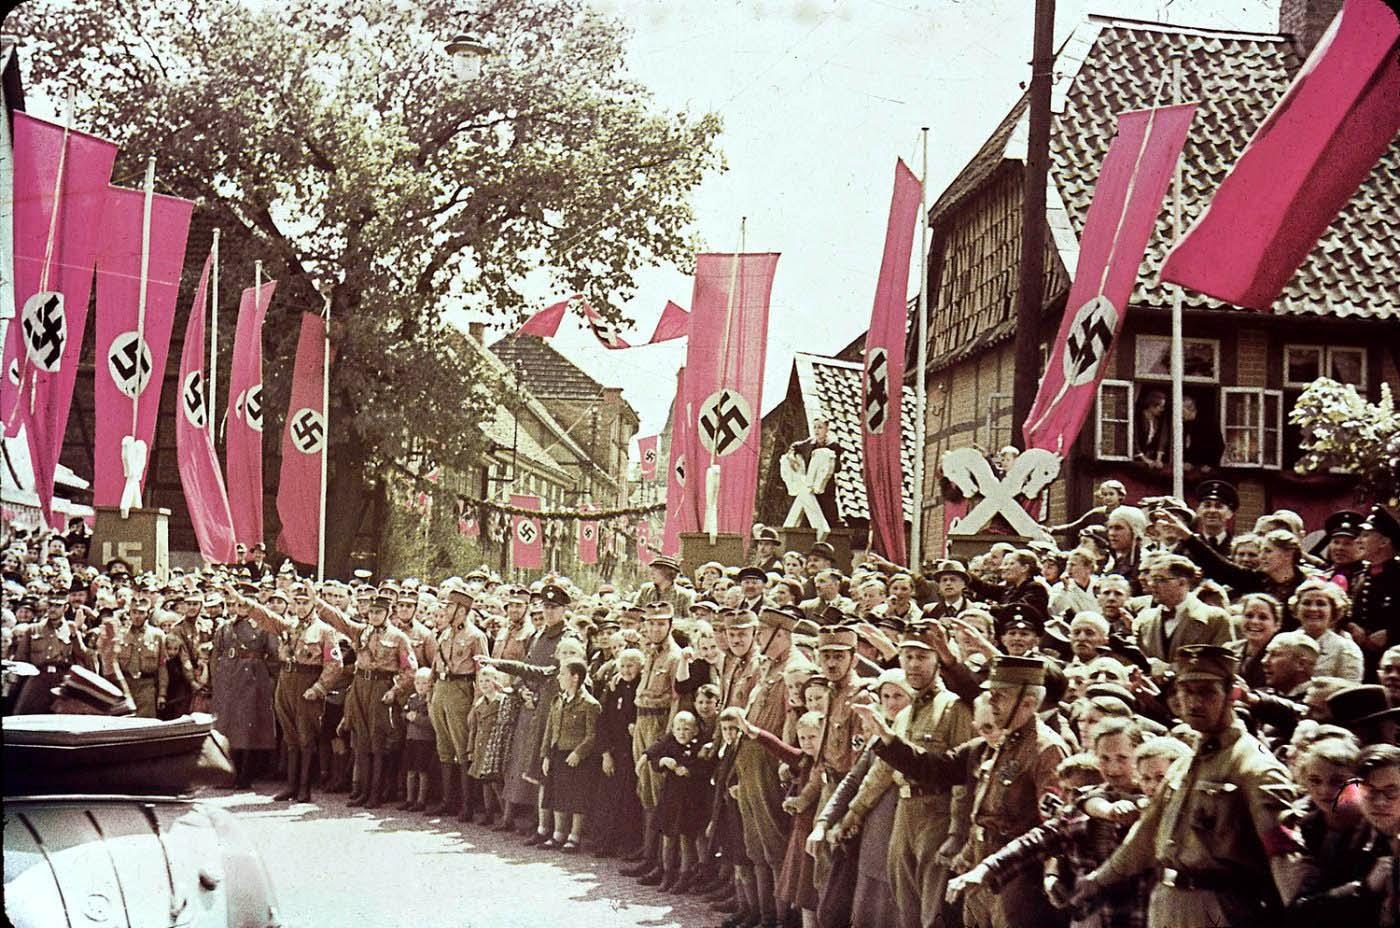 Scene along roadway to the Fallersleben Volkswagen Works cornerstone ceremony, Germany, 1938.